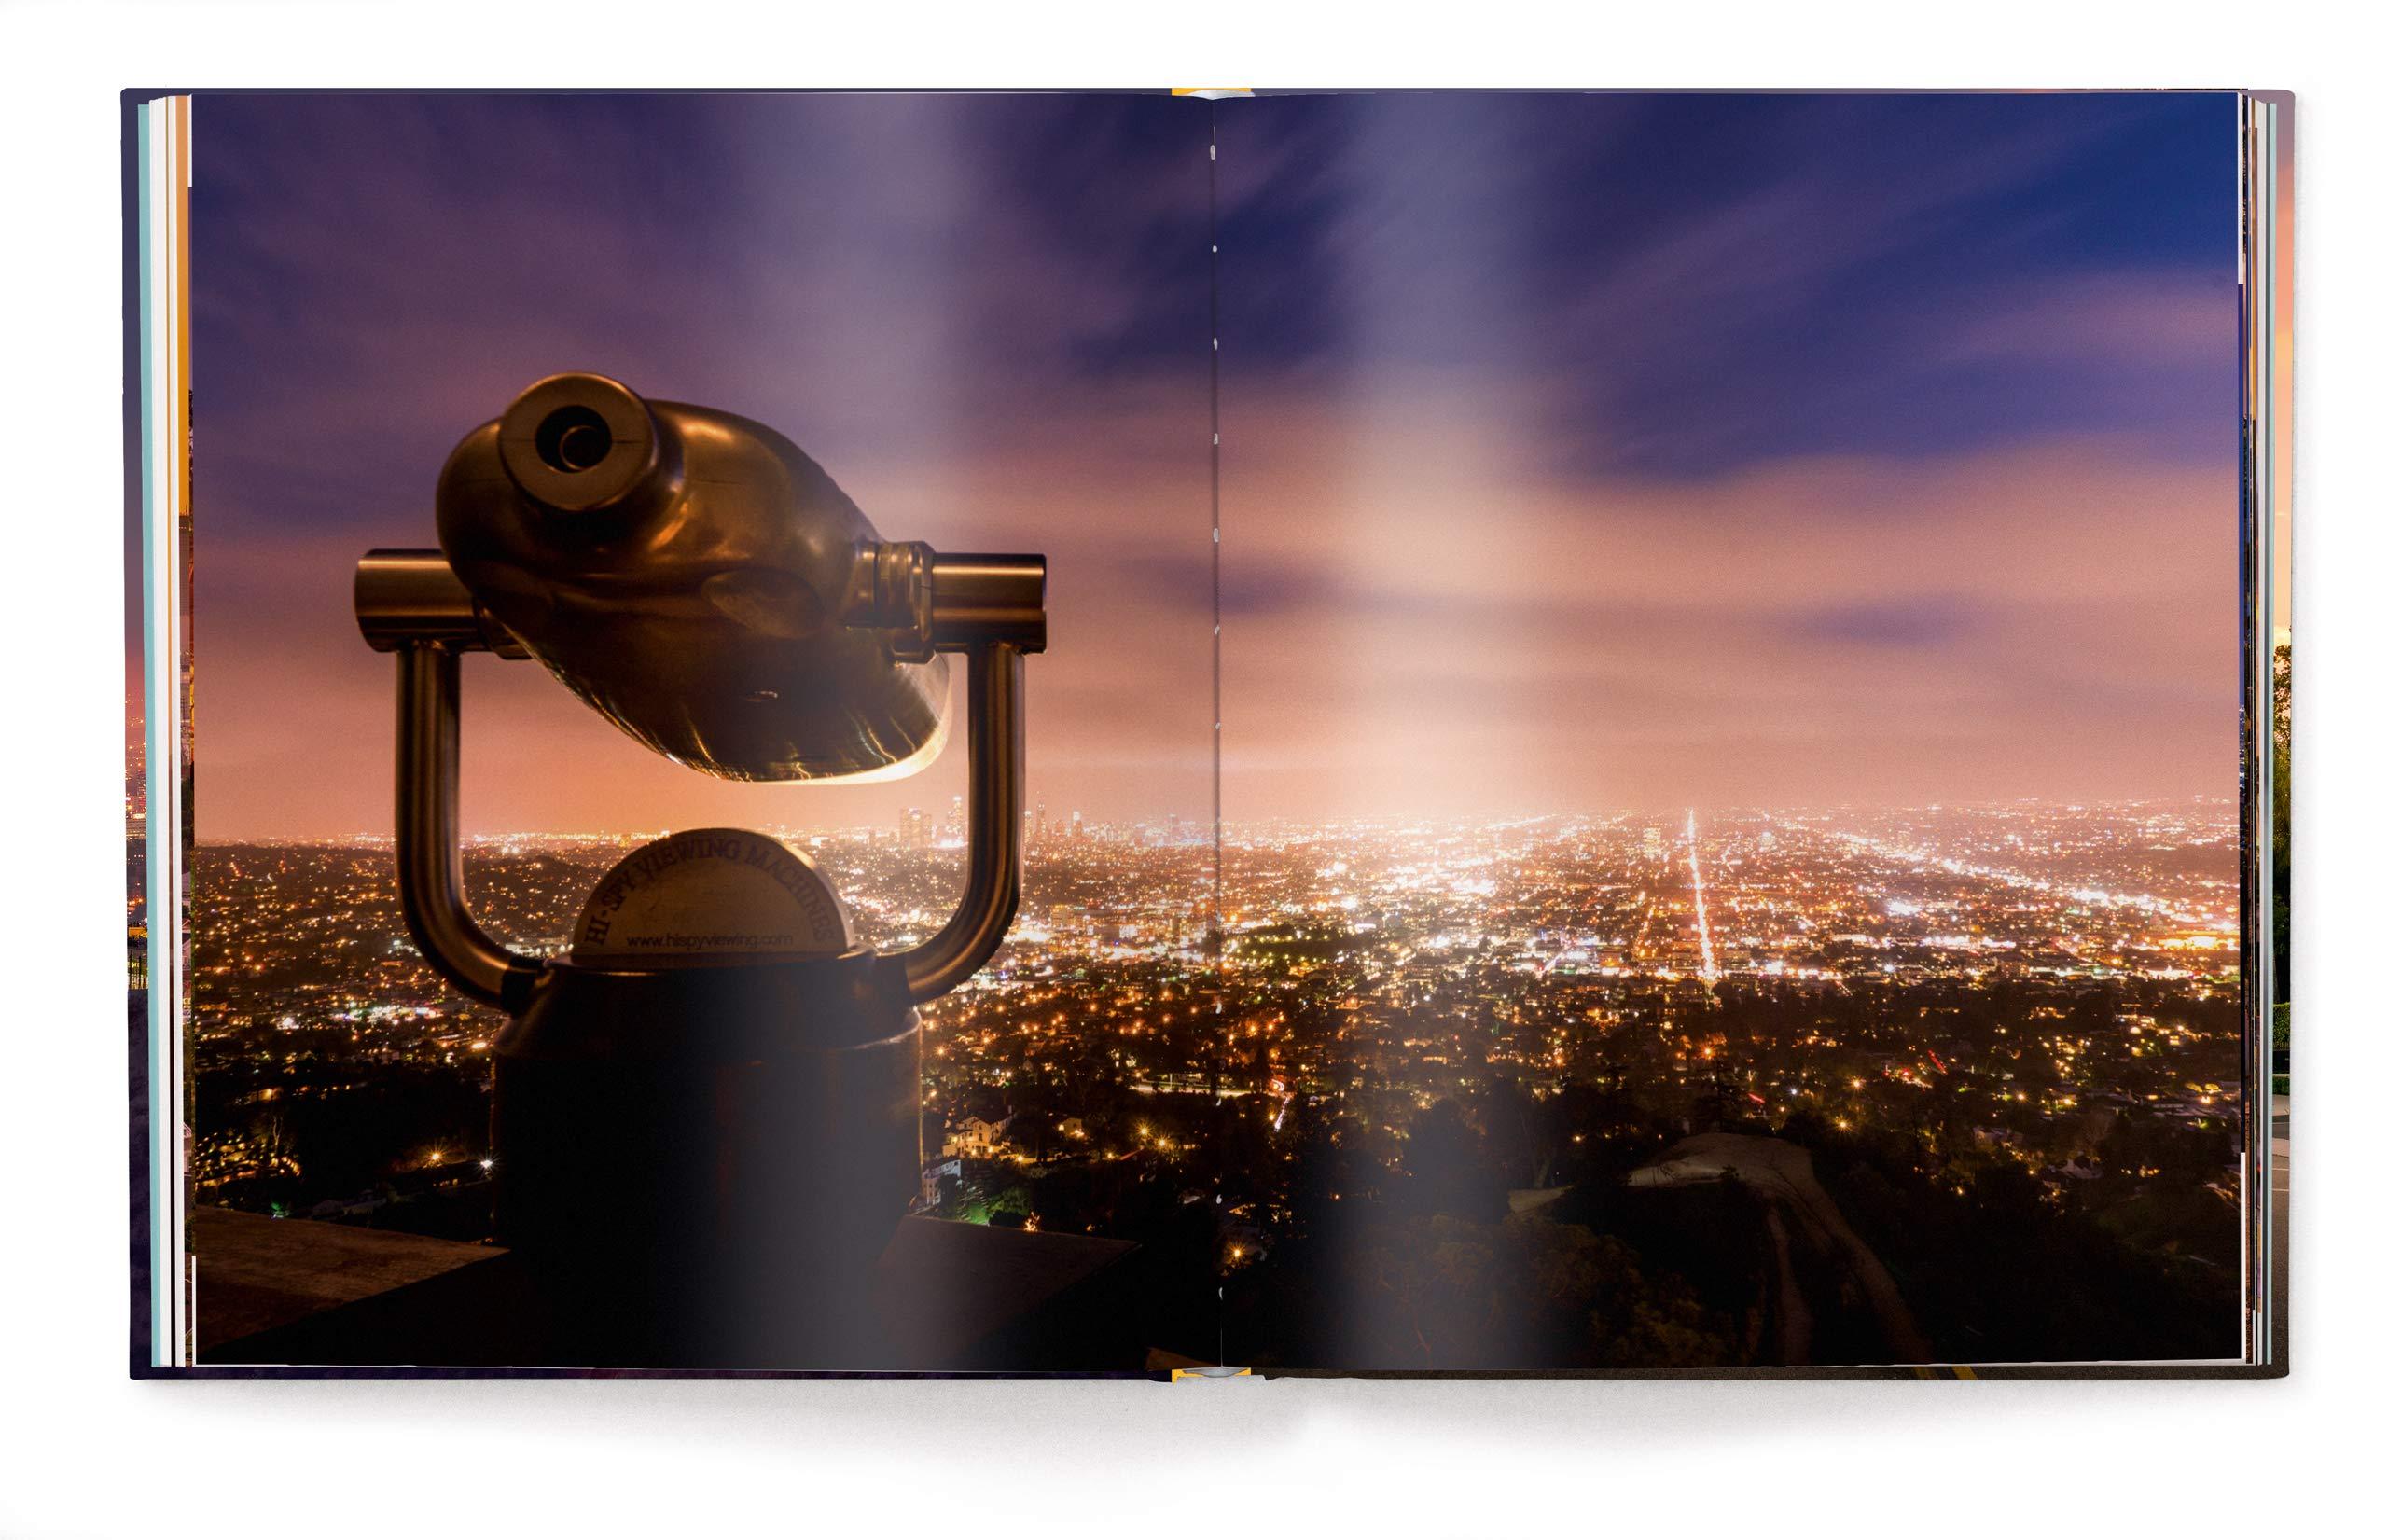 Los Ángeles (L.A.) - Página 2 81i8mAk8C6L